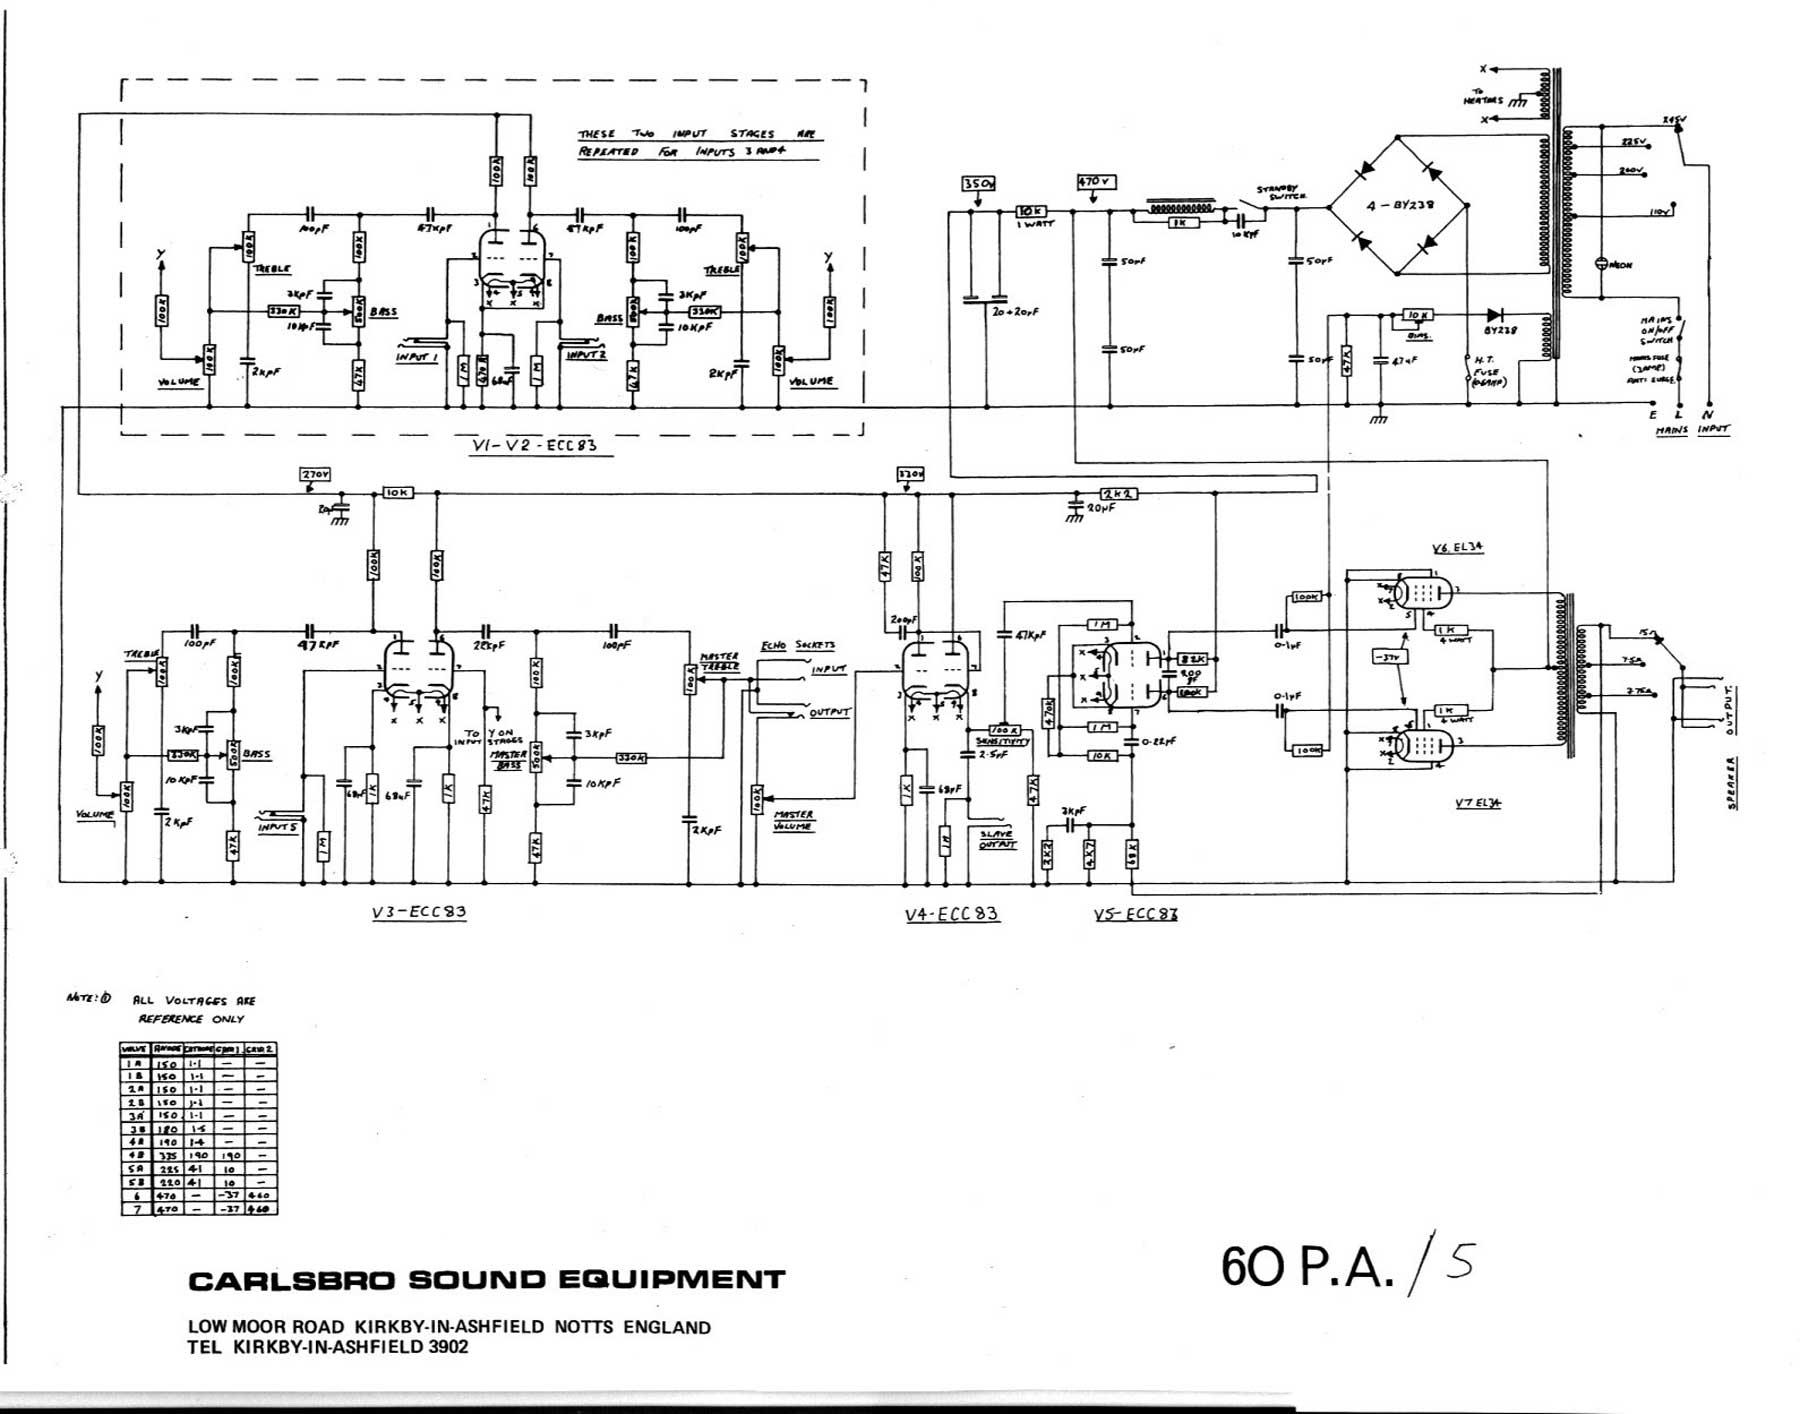 22 pa wiring pa wiring diagram e2 wiring diagram  pa wiring diagram e2 wiring diagram